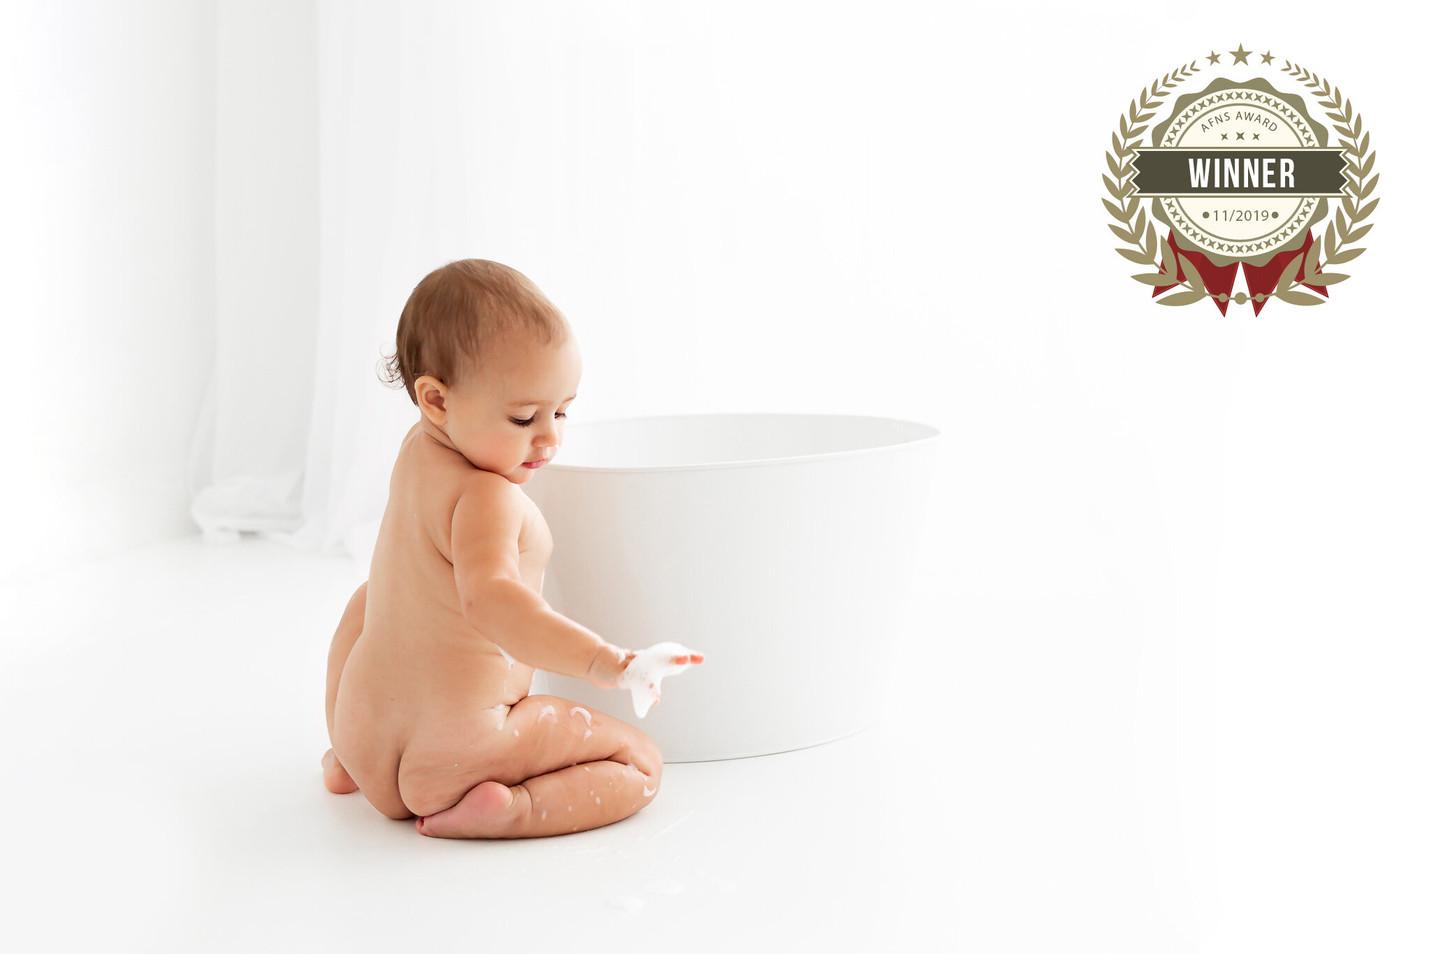 AFNS Awarded Roxy Art Photography